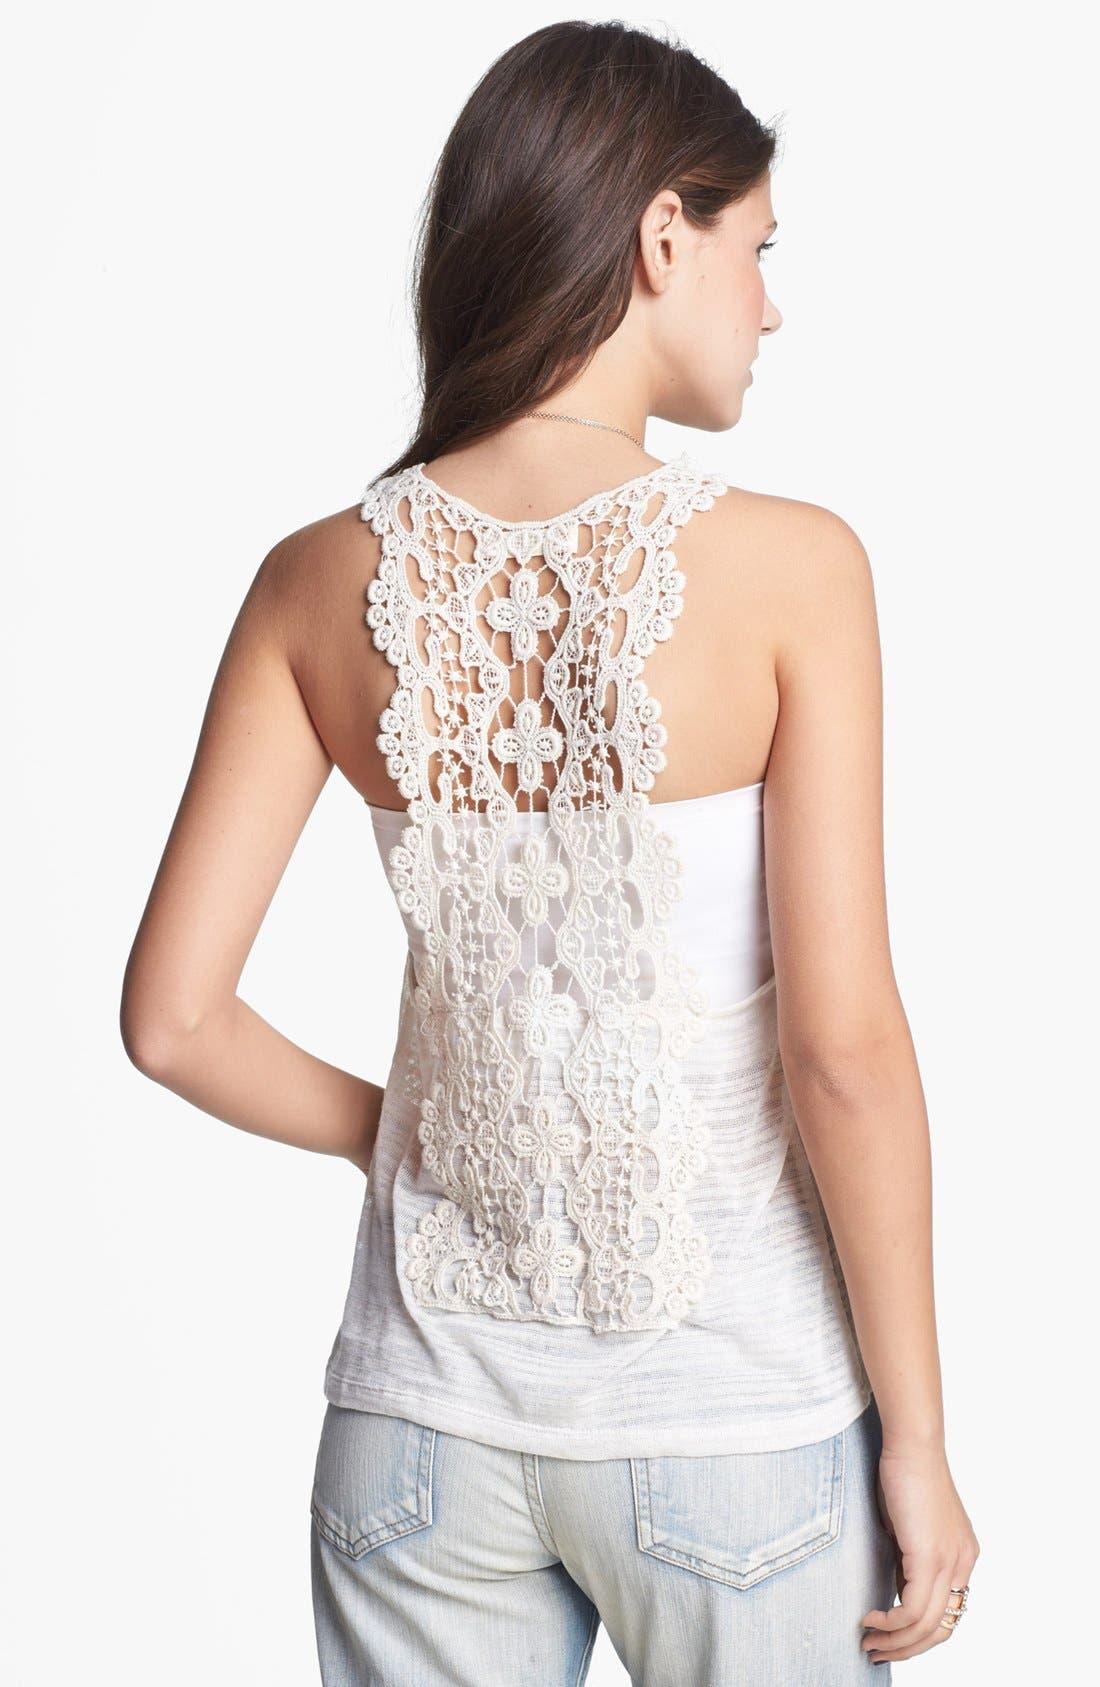 Alternate Image 1 Selected - Painted Threads Crochet Back Pointelle Tank (Juniors)